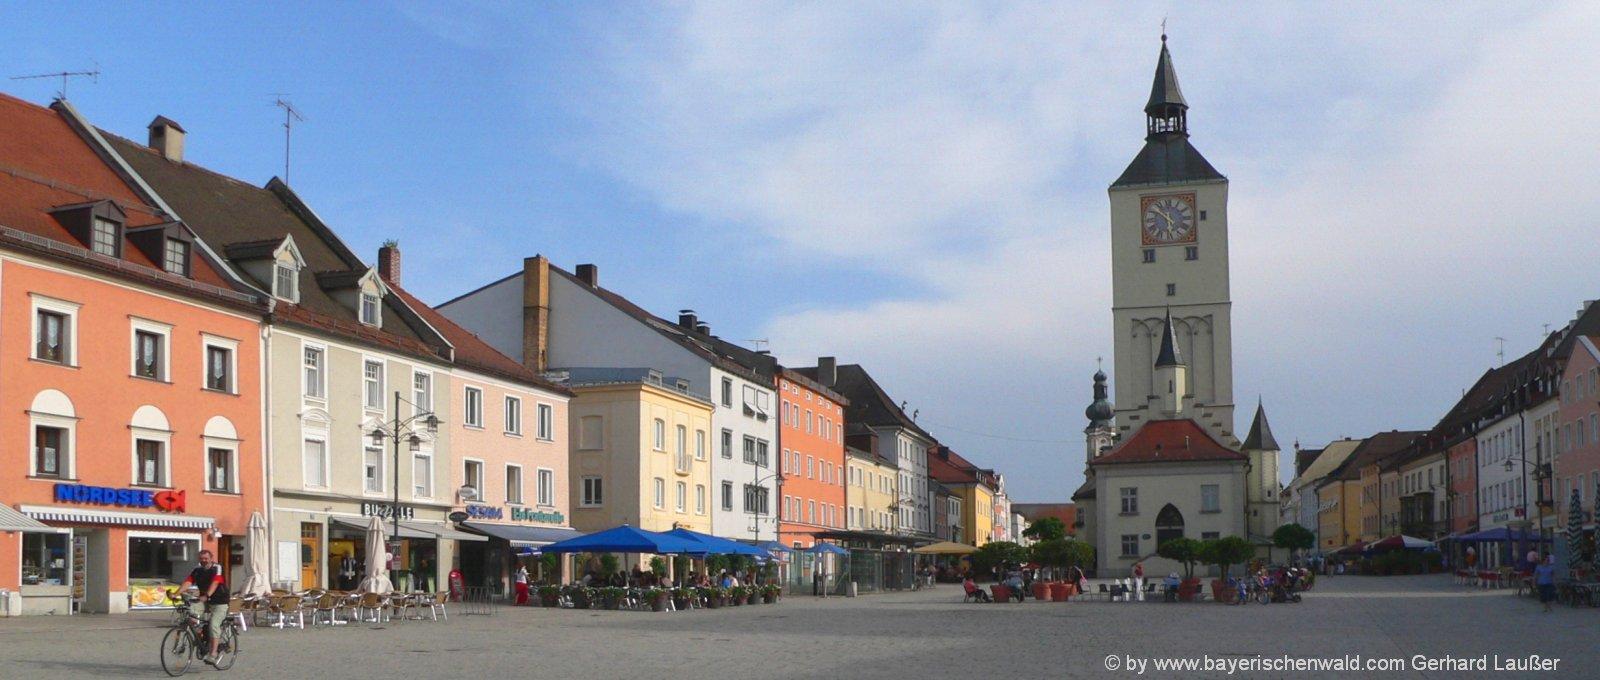 deggendorf-monteurunterrkunft-niederbayern-ausflugsziele-stadtplatz